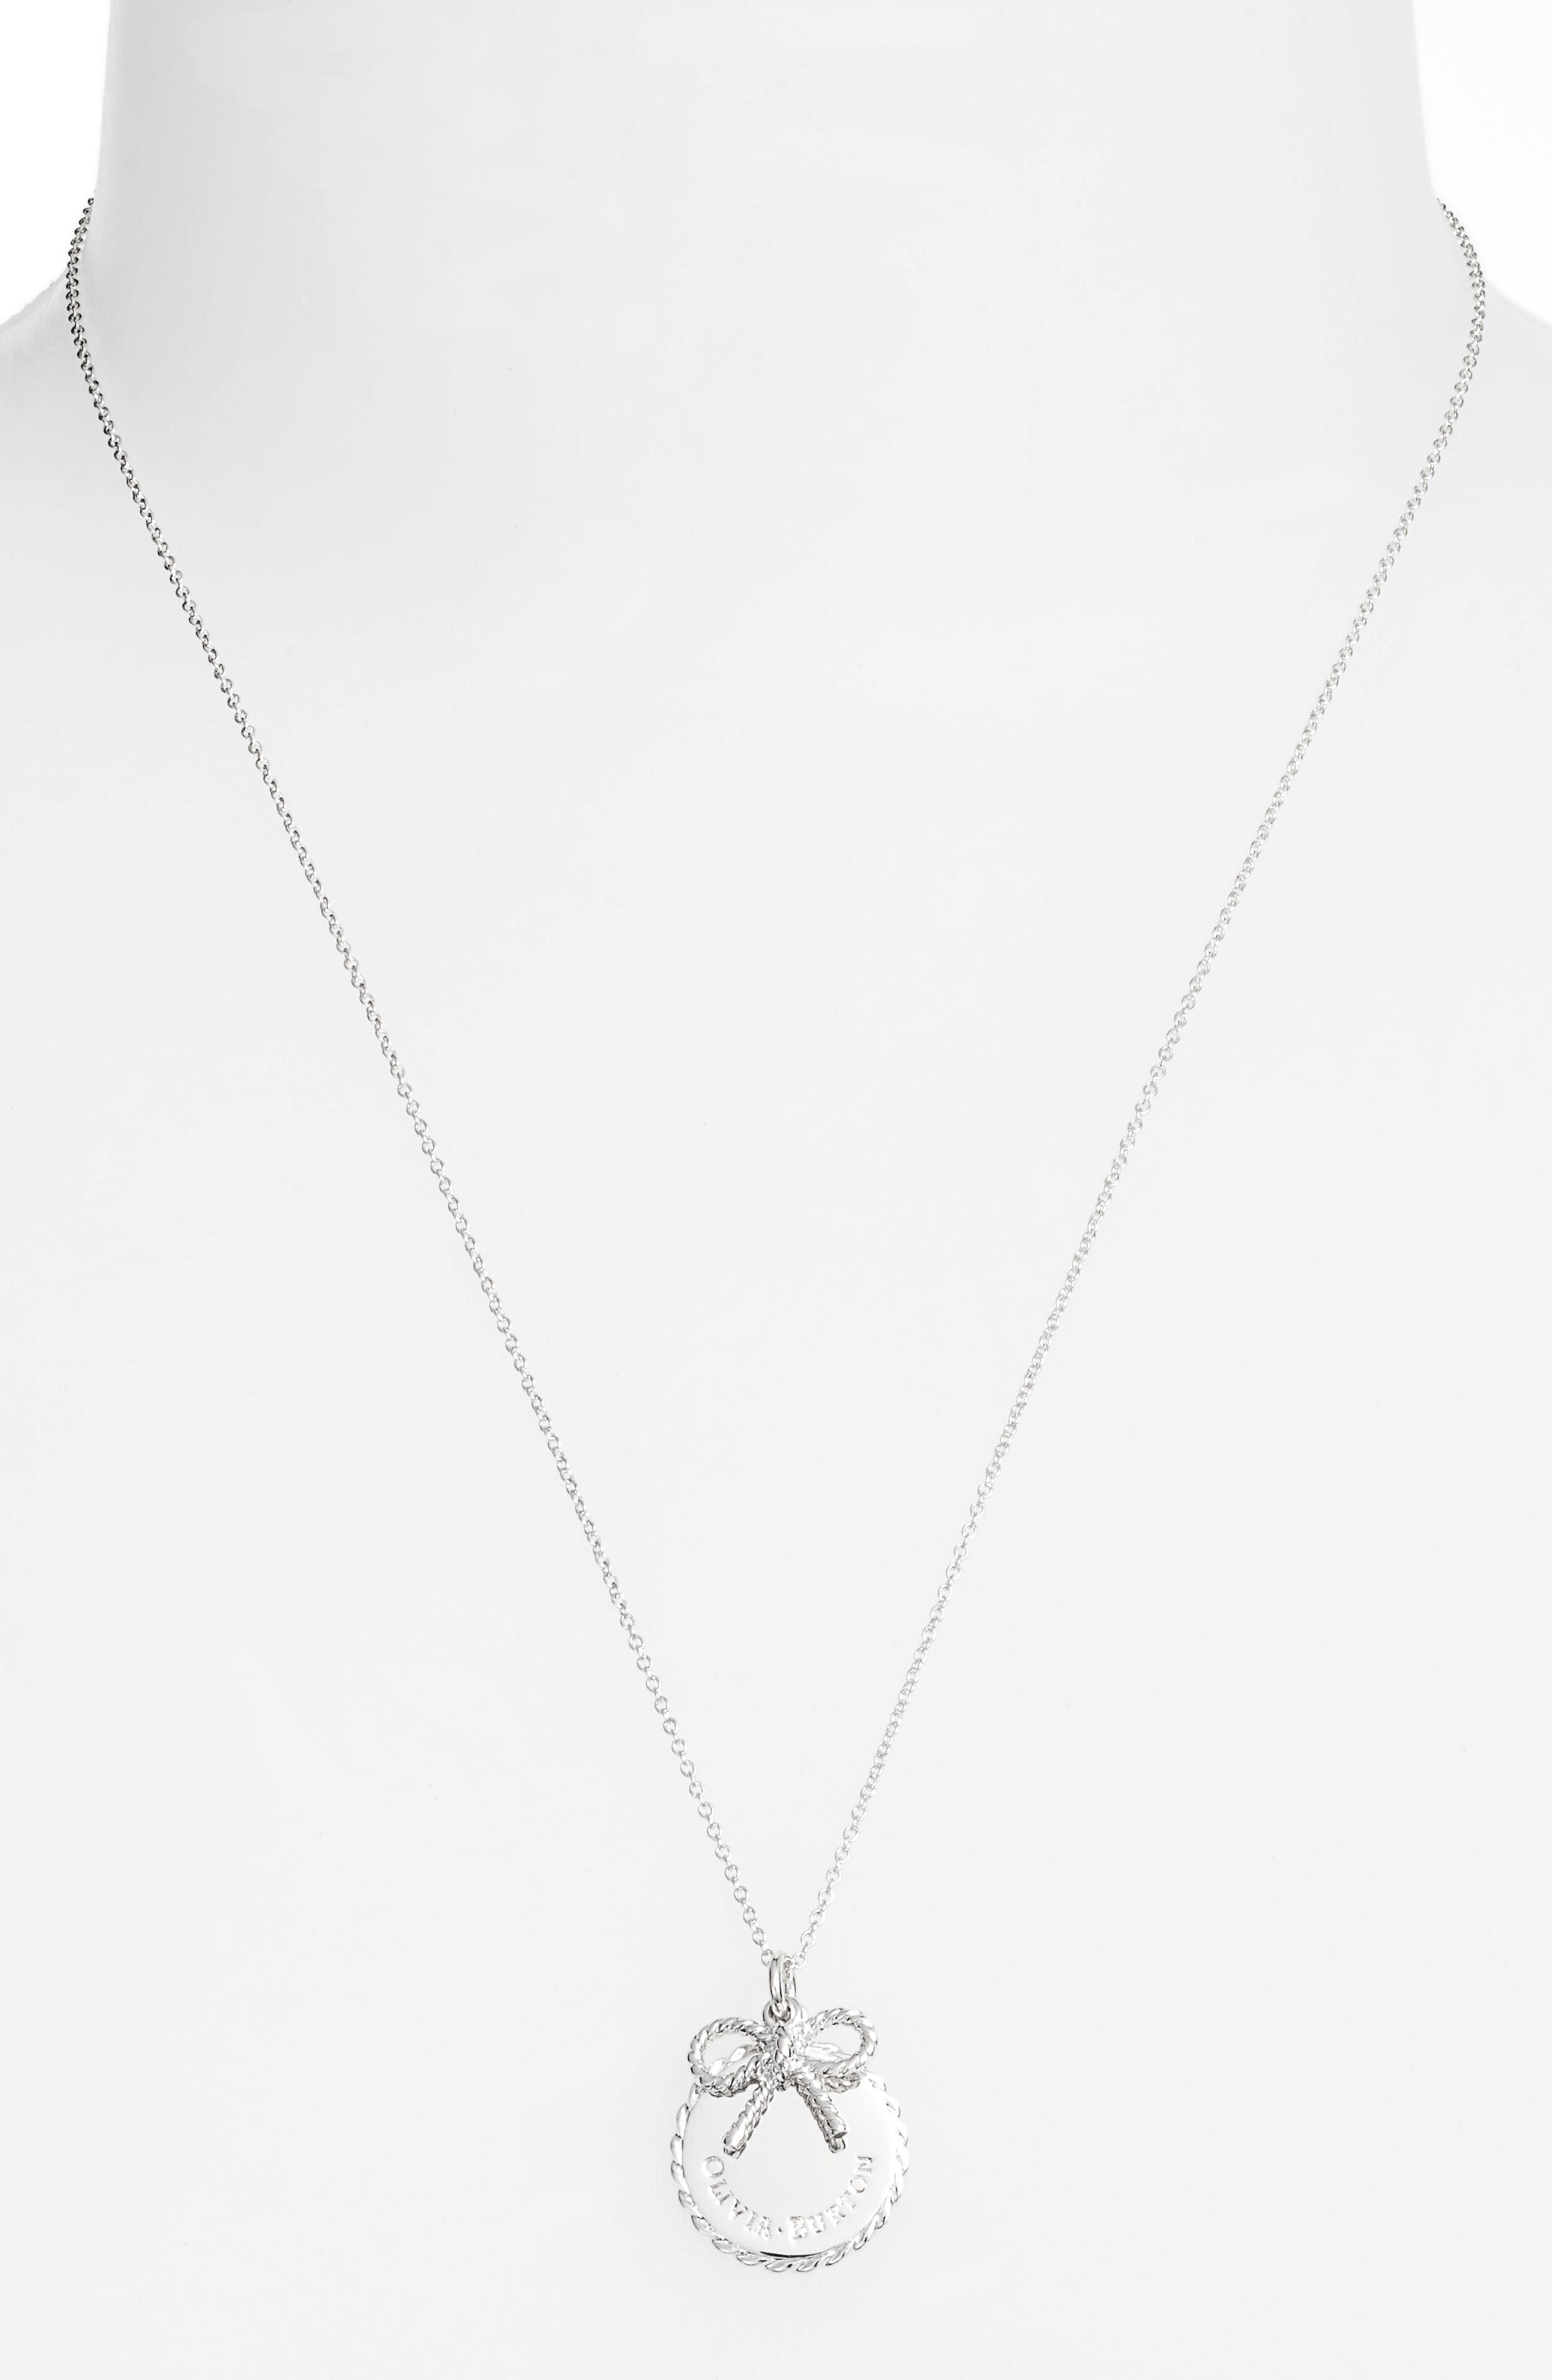 Coin Bow Pendant Necklace,                             Alternate thumbnail 2, color,                             Silver